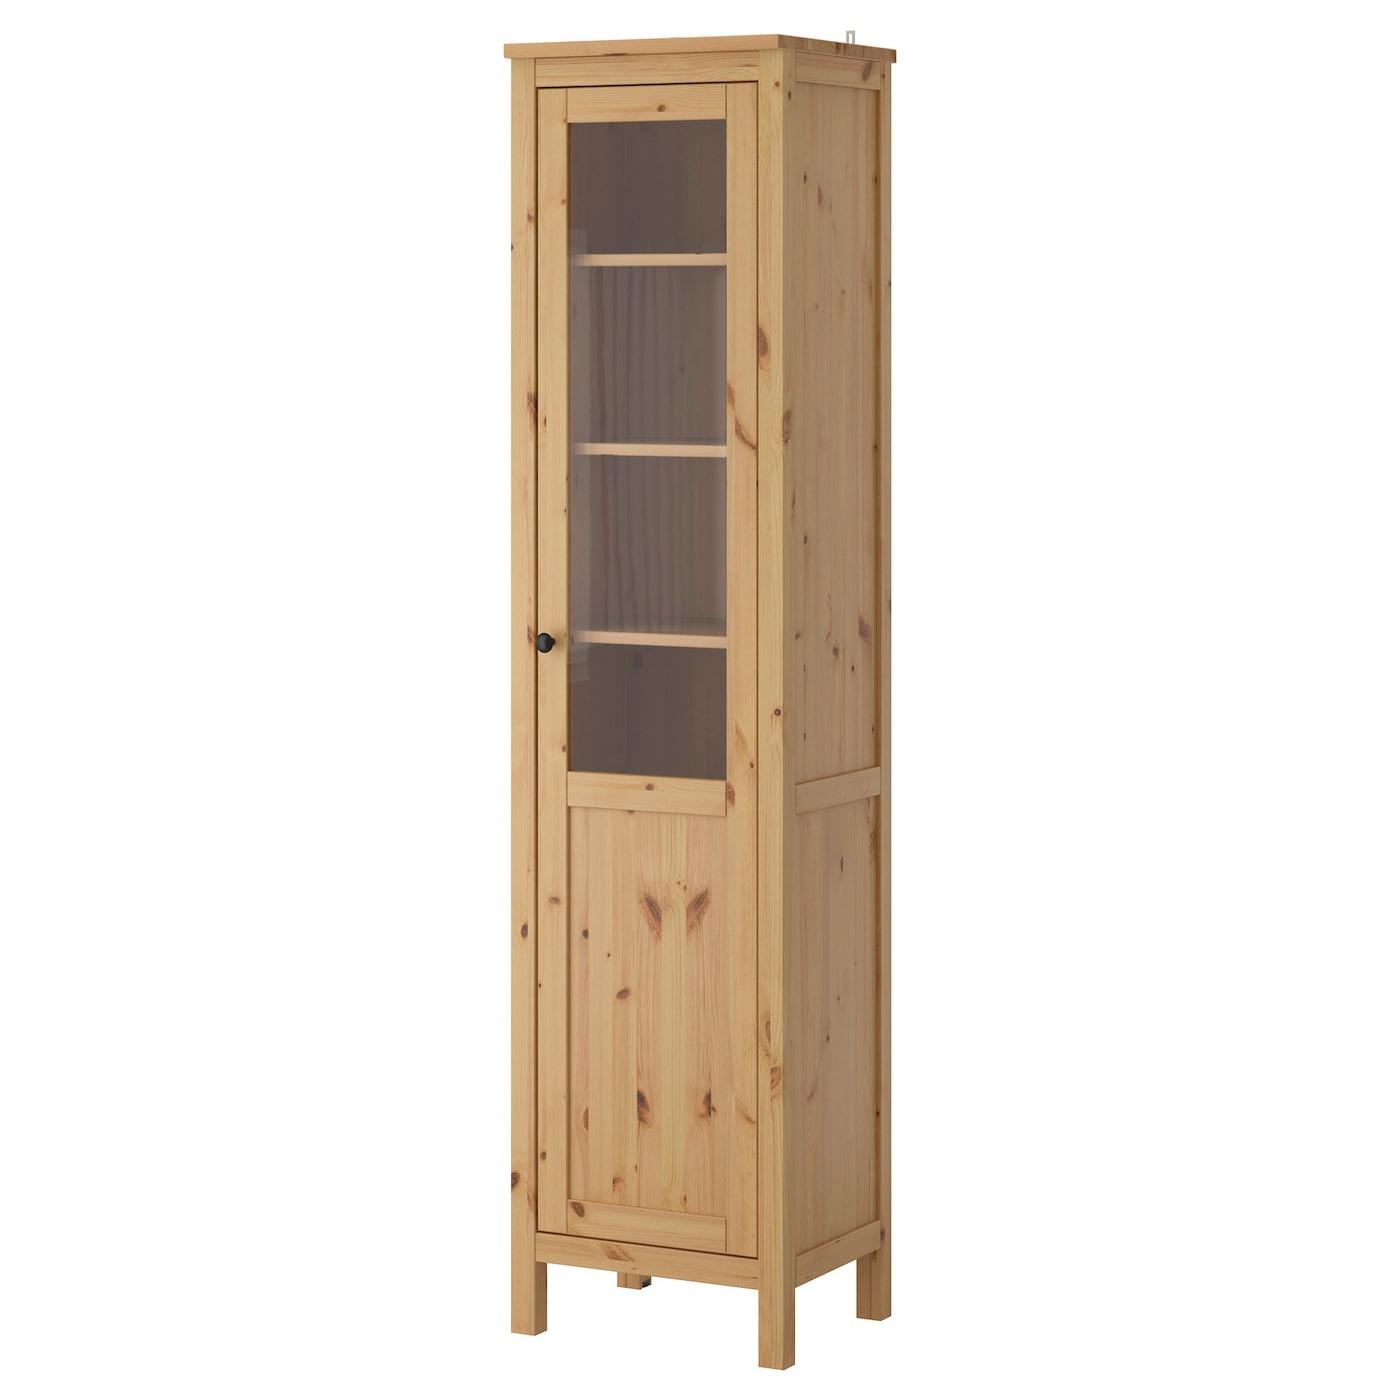 hemnes cabinet with panel glass door light brown 49x197 cm. Black Bedroom Furniture Sets. Home Design Ideas